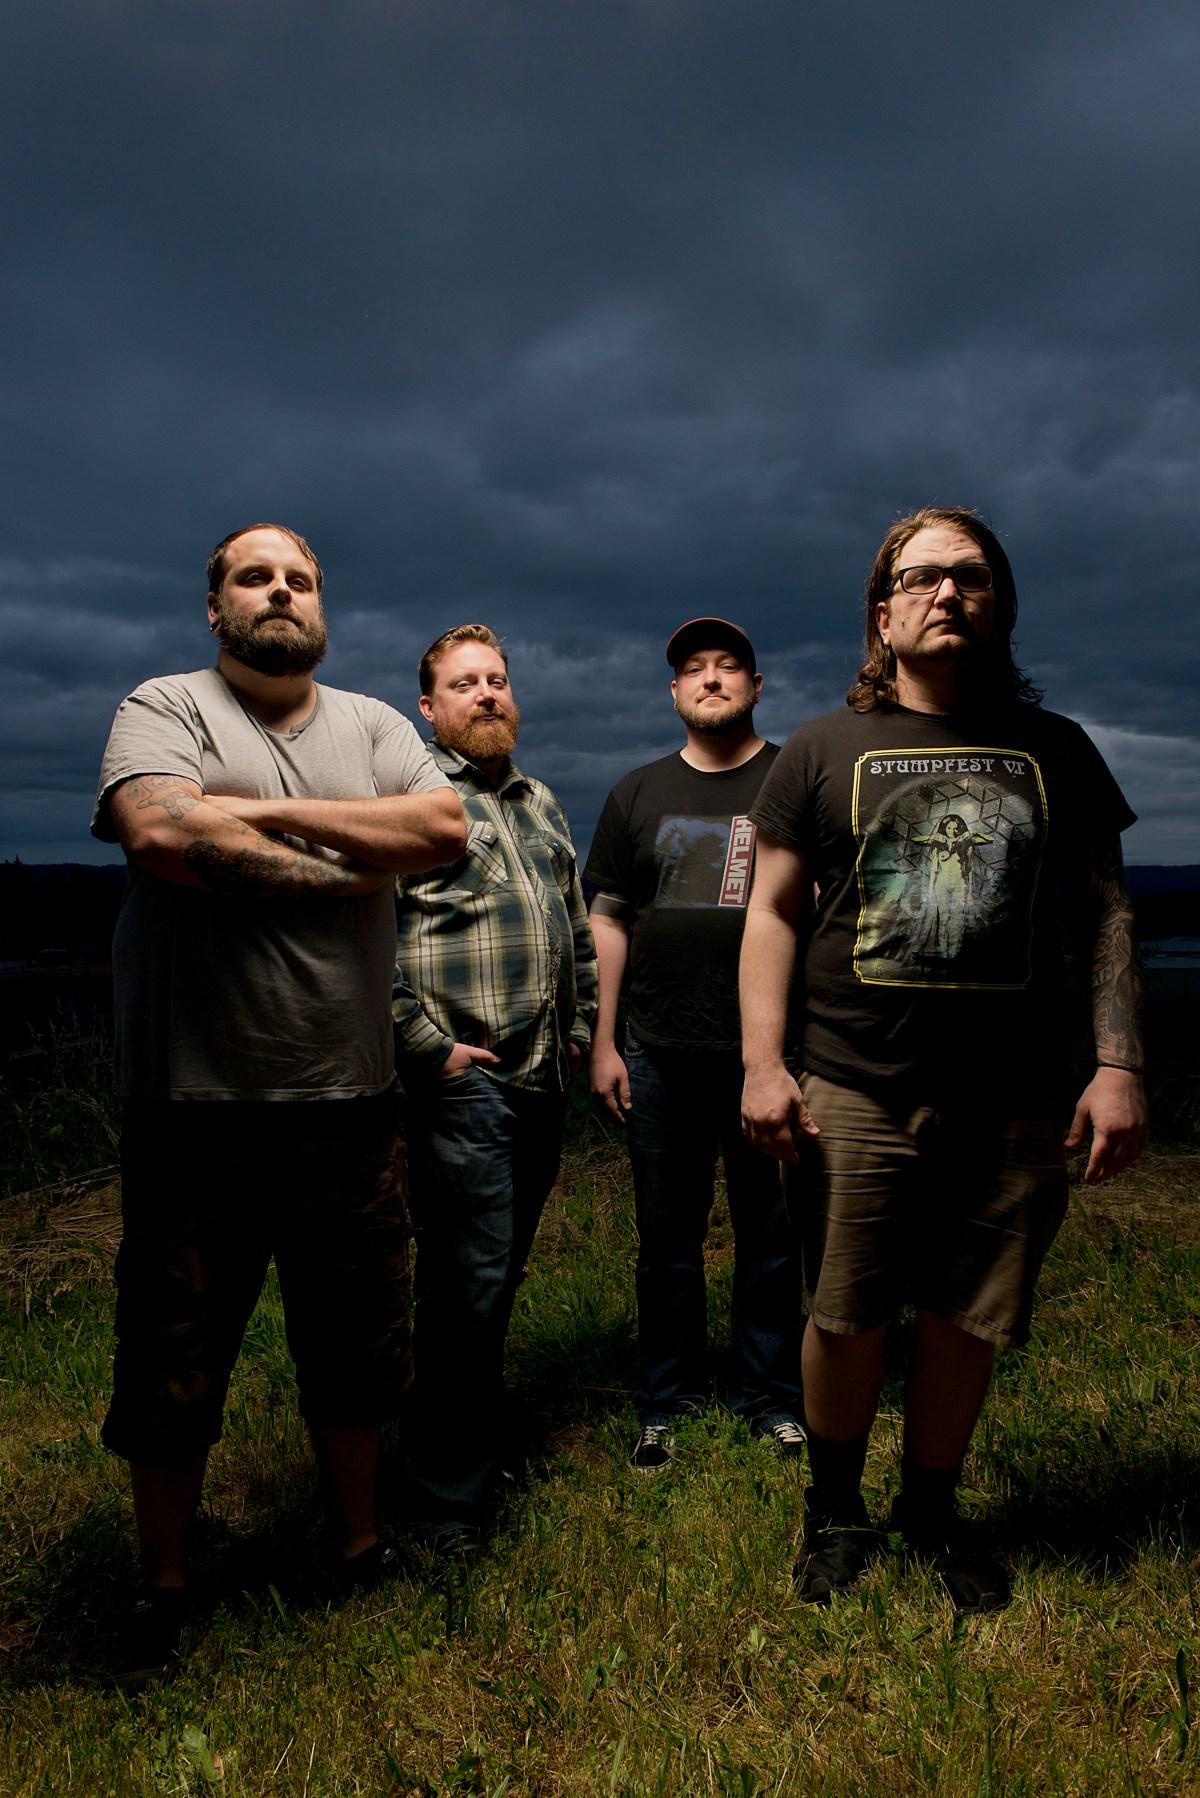 Mark Bassett, Jayson Smith, Travis Wisner, David, are Maximum Mad Noise Rock